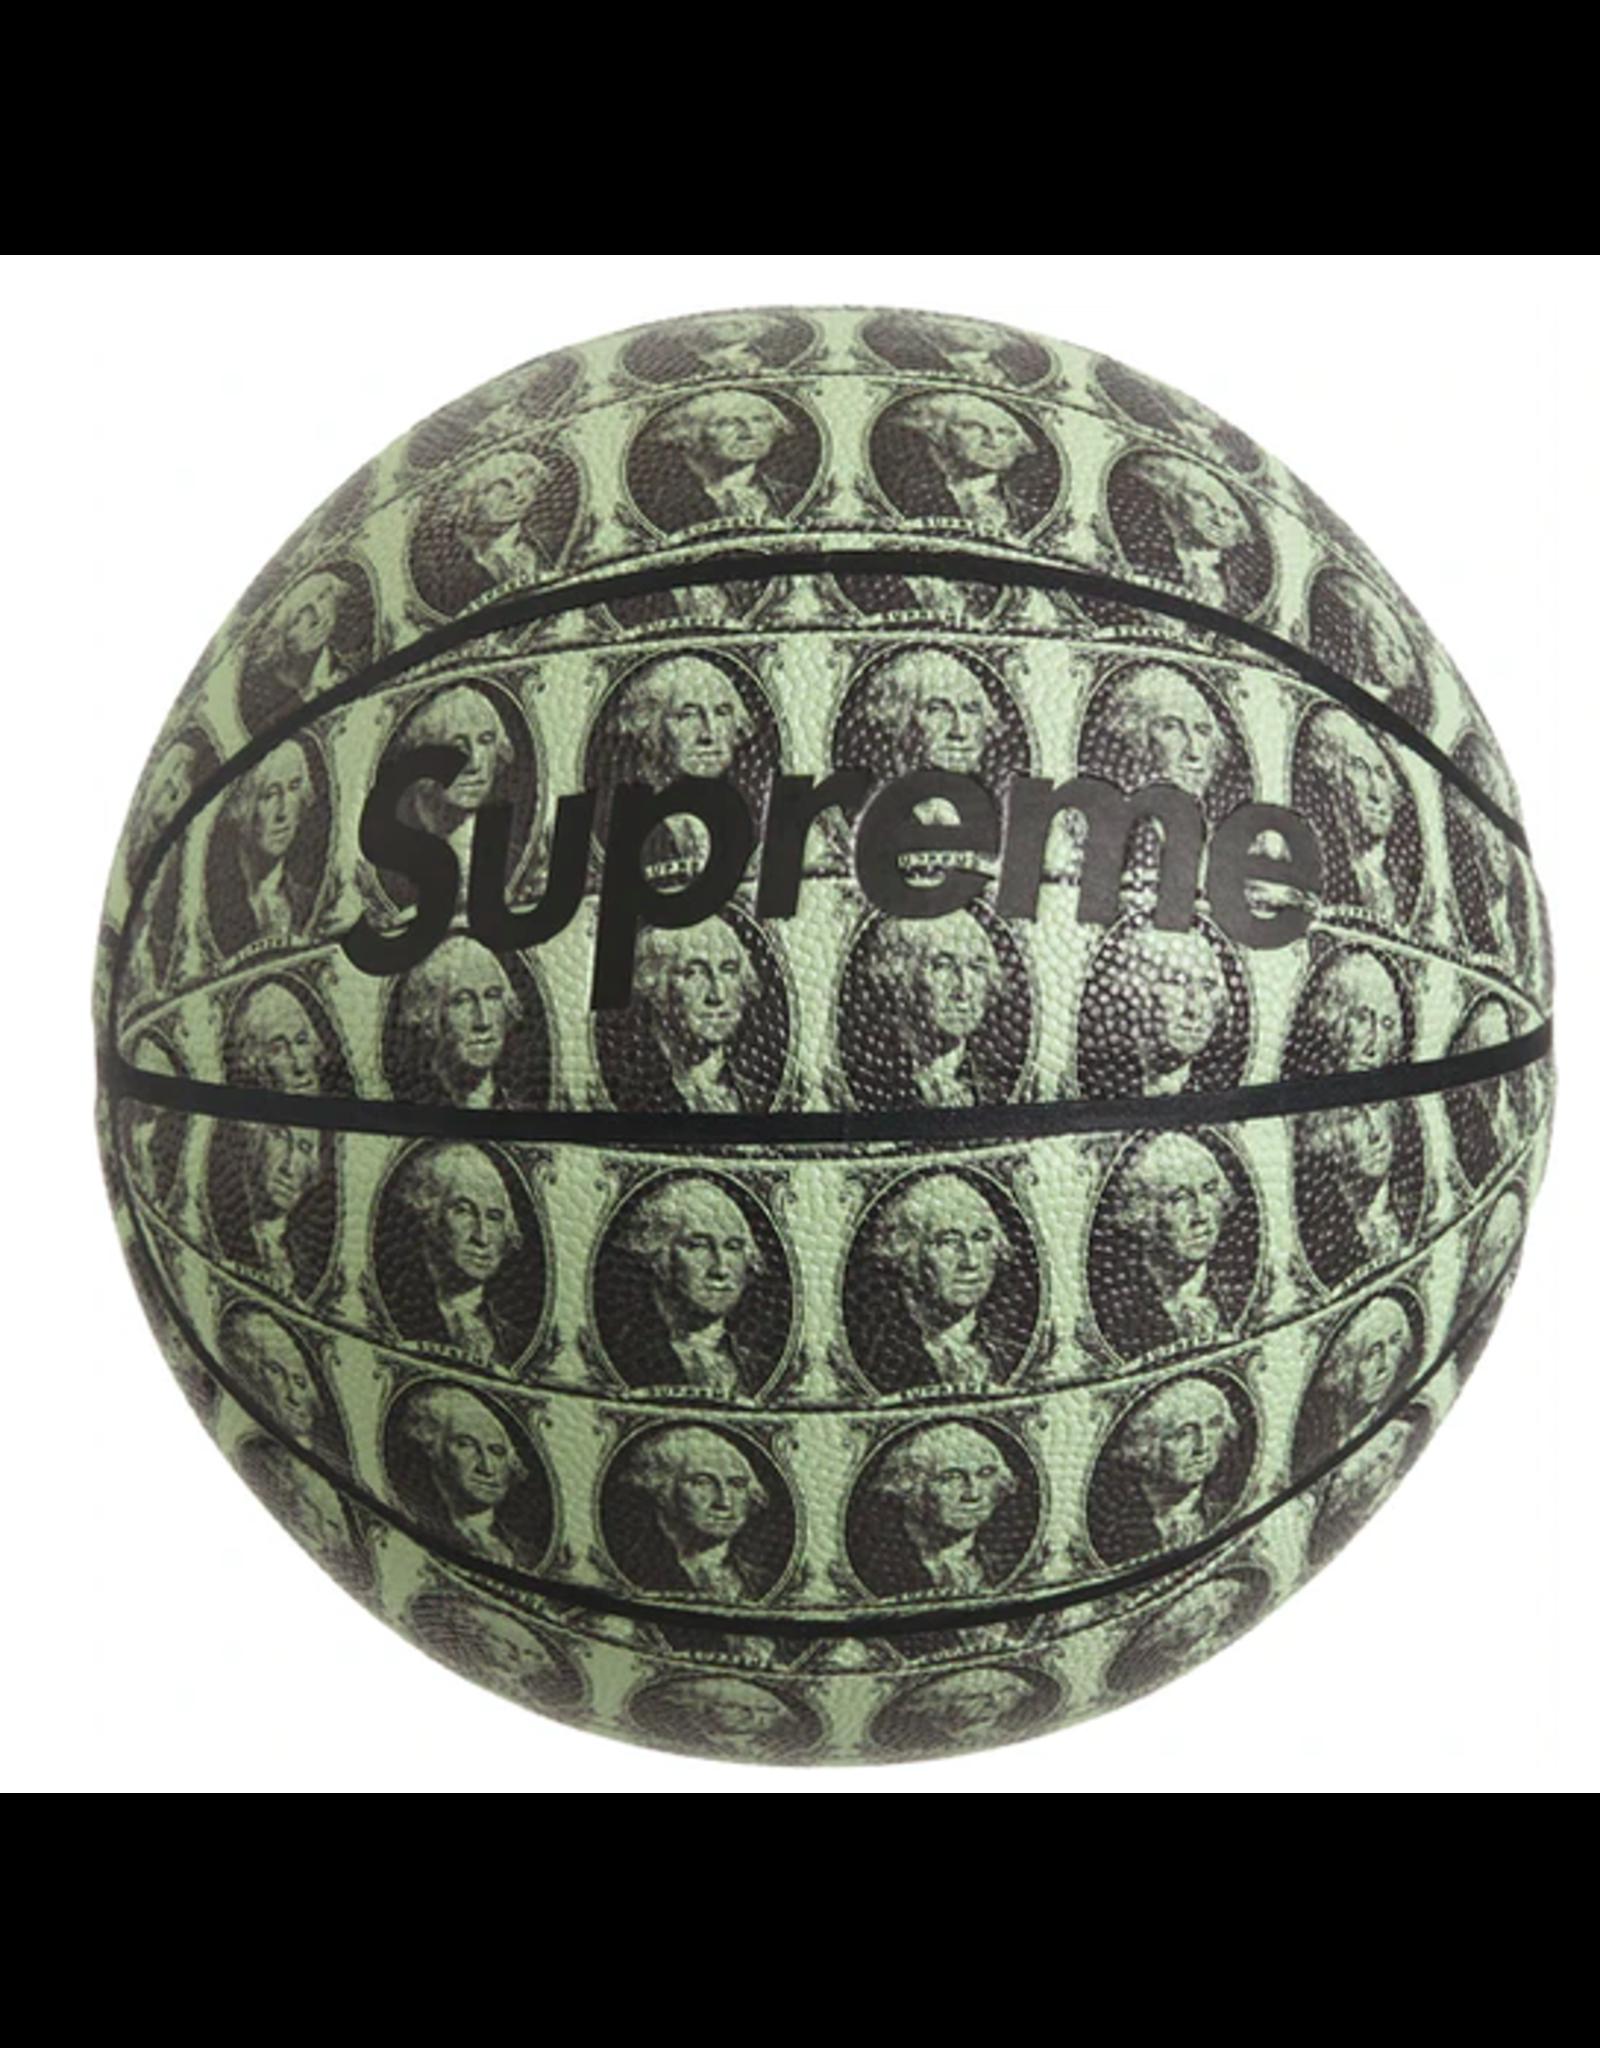 SUPREME Supreme Spalding Washington Basketball Pale Mint